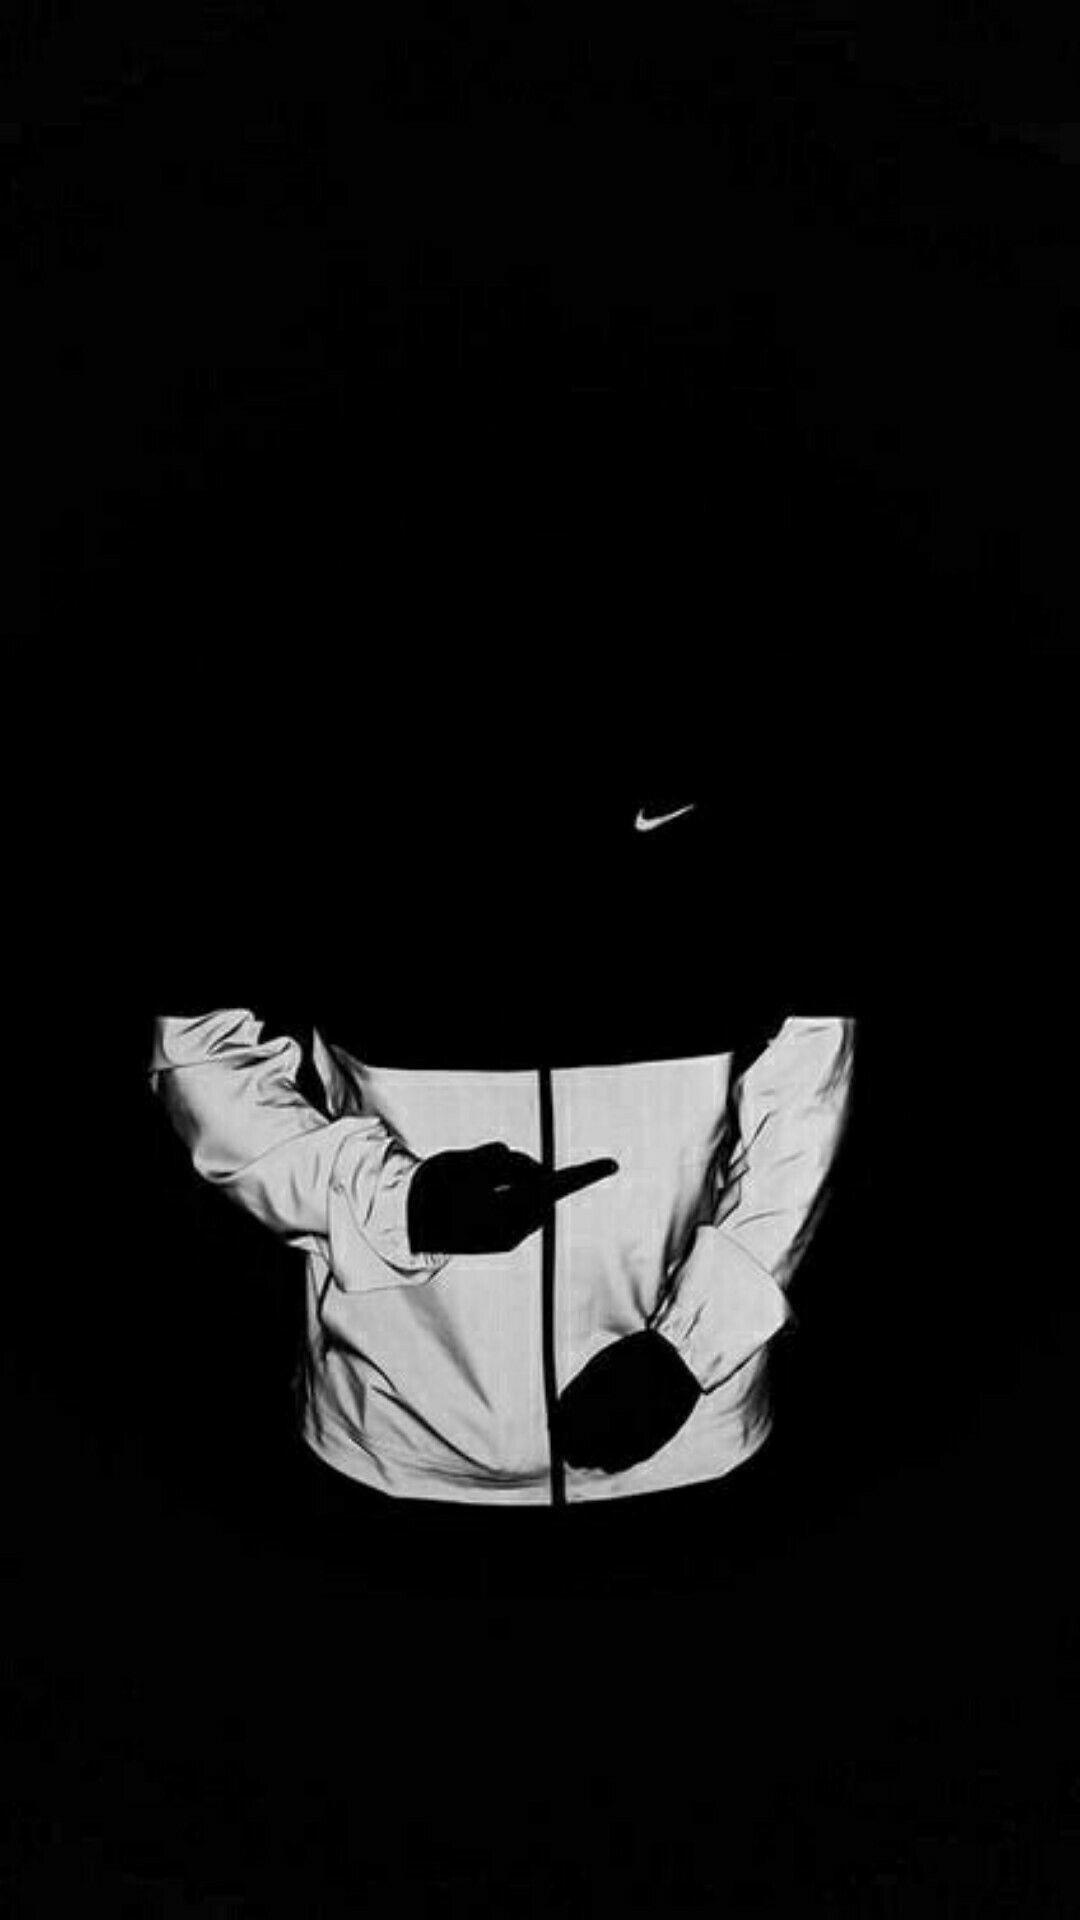 Iphone 6 Black Nike Wallpaper